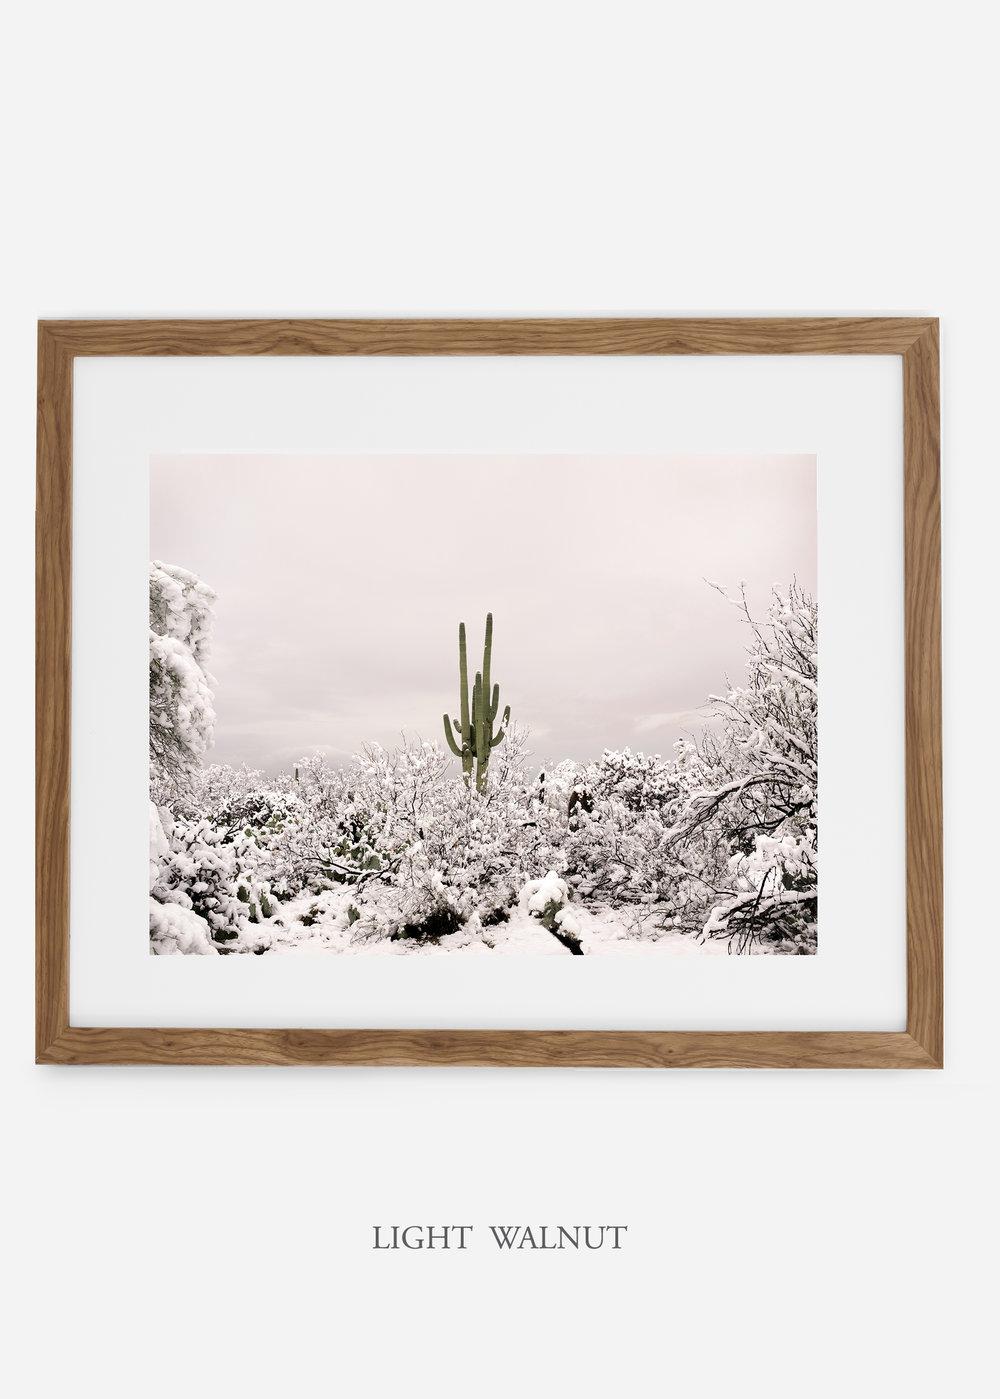 lightwalnutframe-saguaroNo.1-wildercalifornia-art-wallart-cactusprint-homedecor-prints-arizona-botanical-artwork-interiordesign.jpg